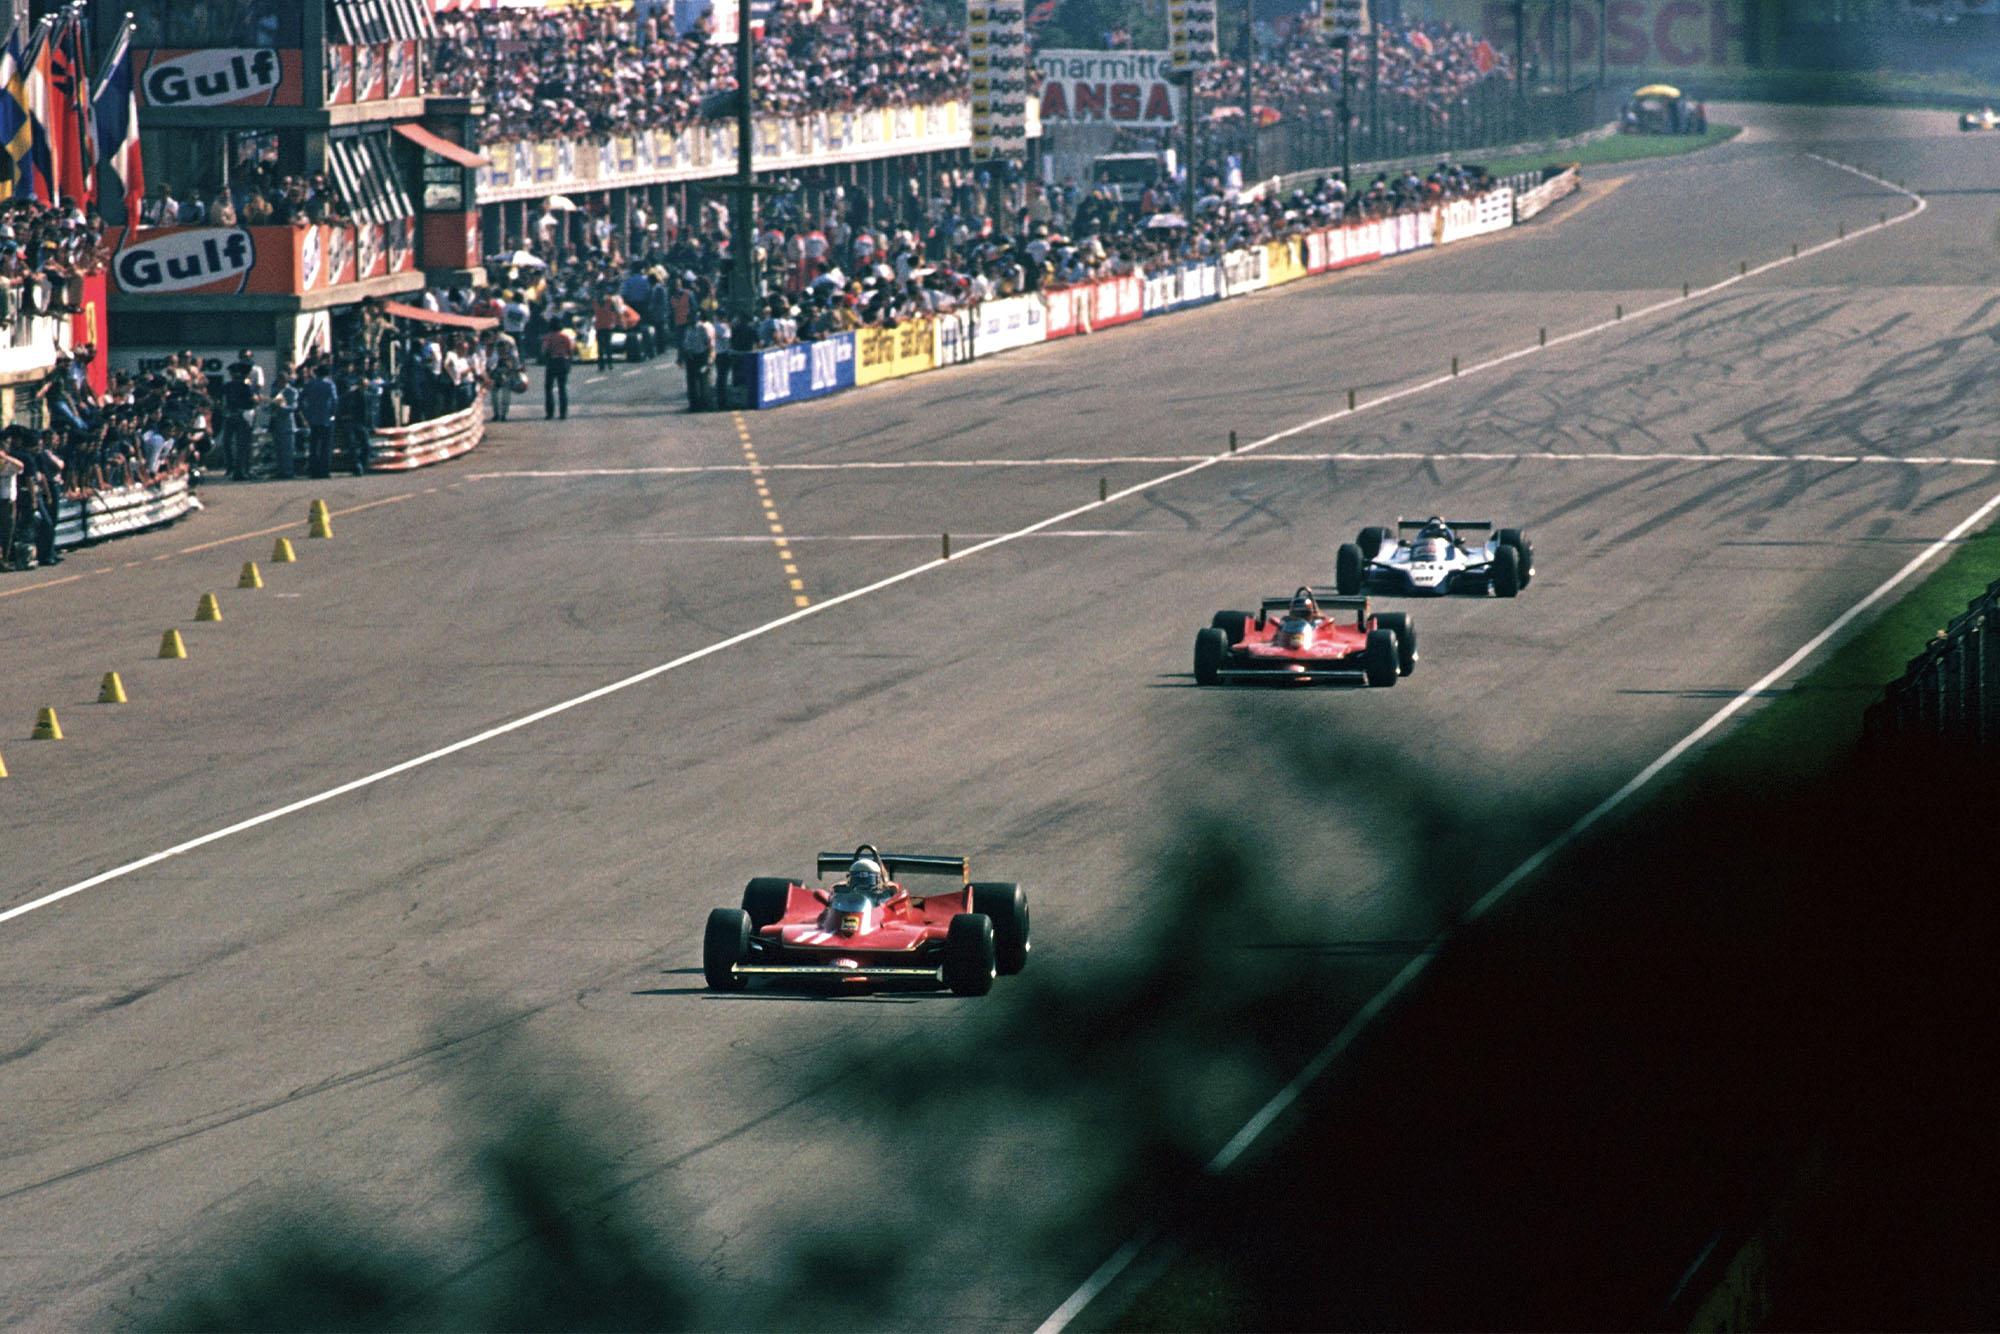 1979 Italian GP race